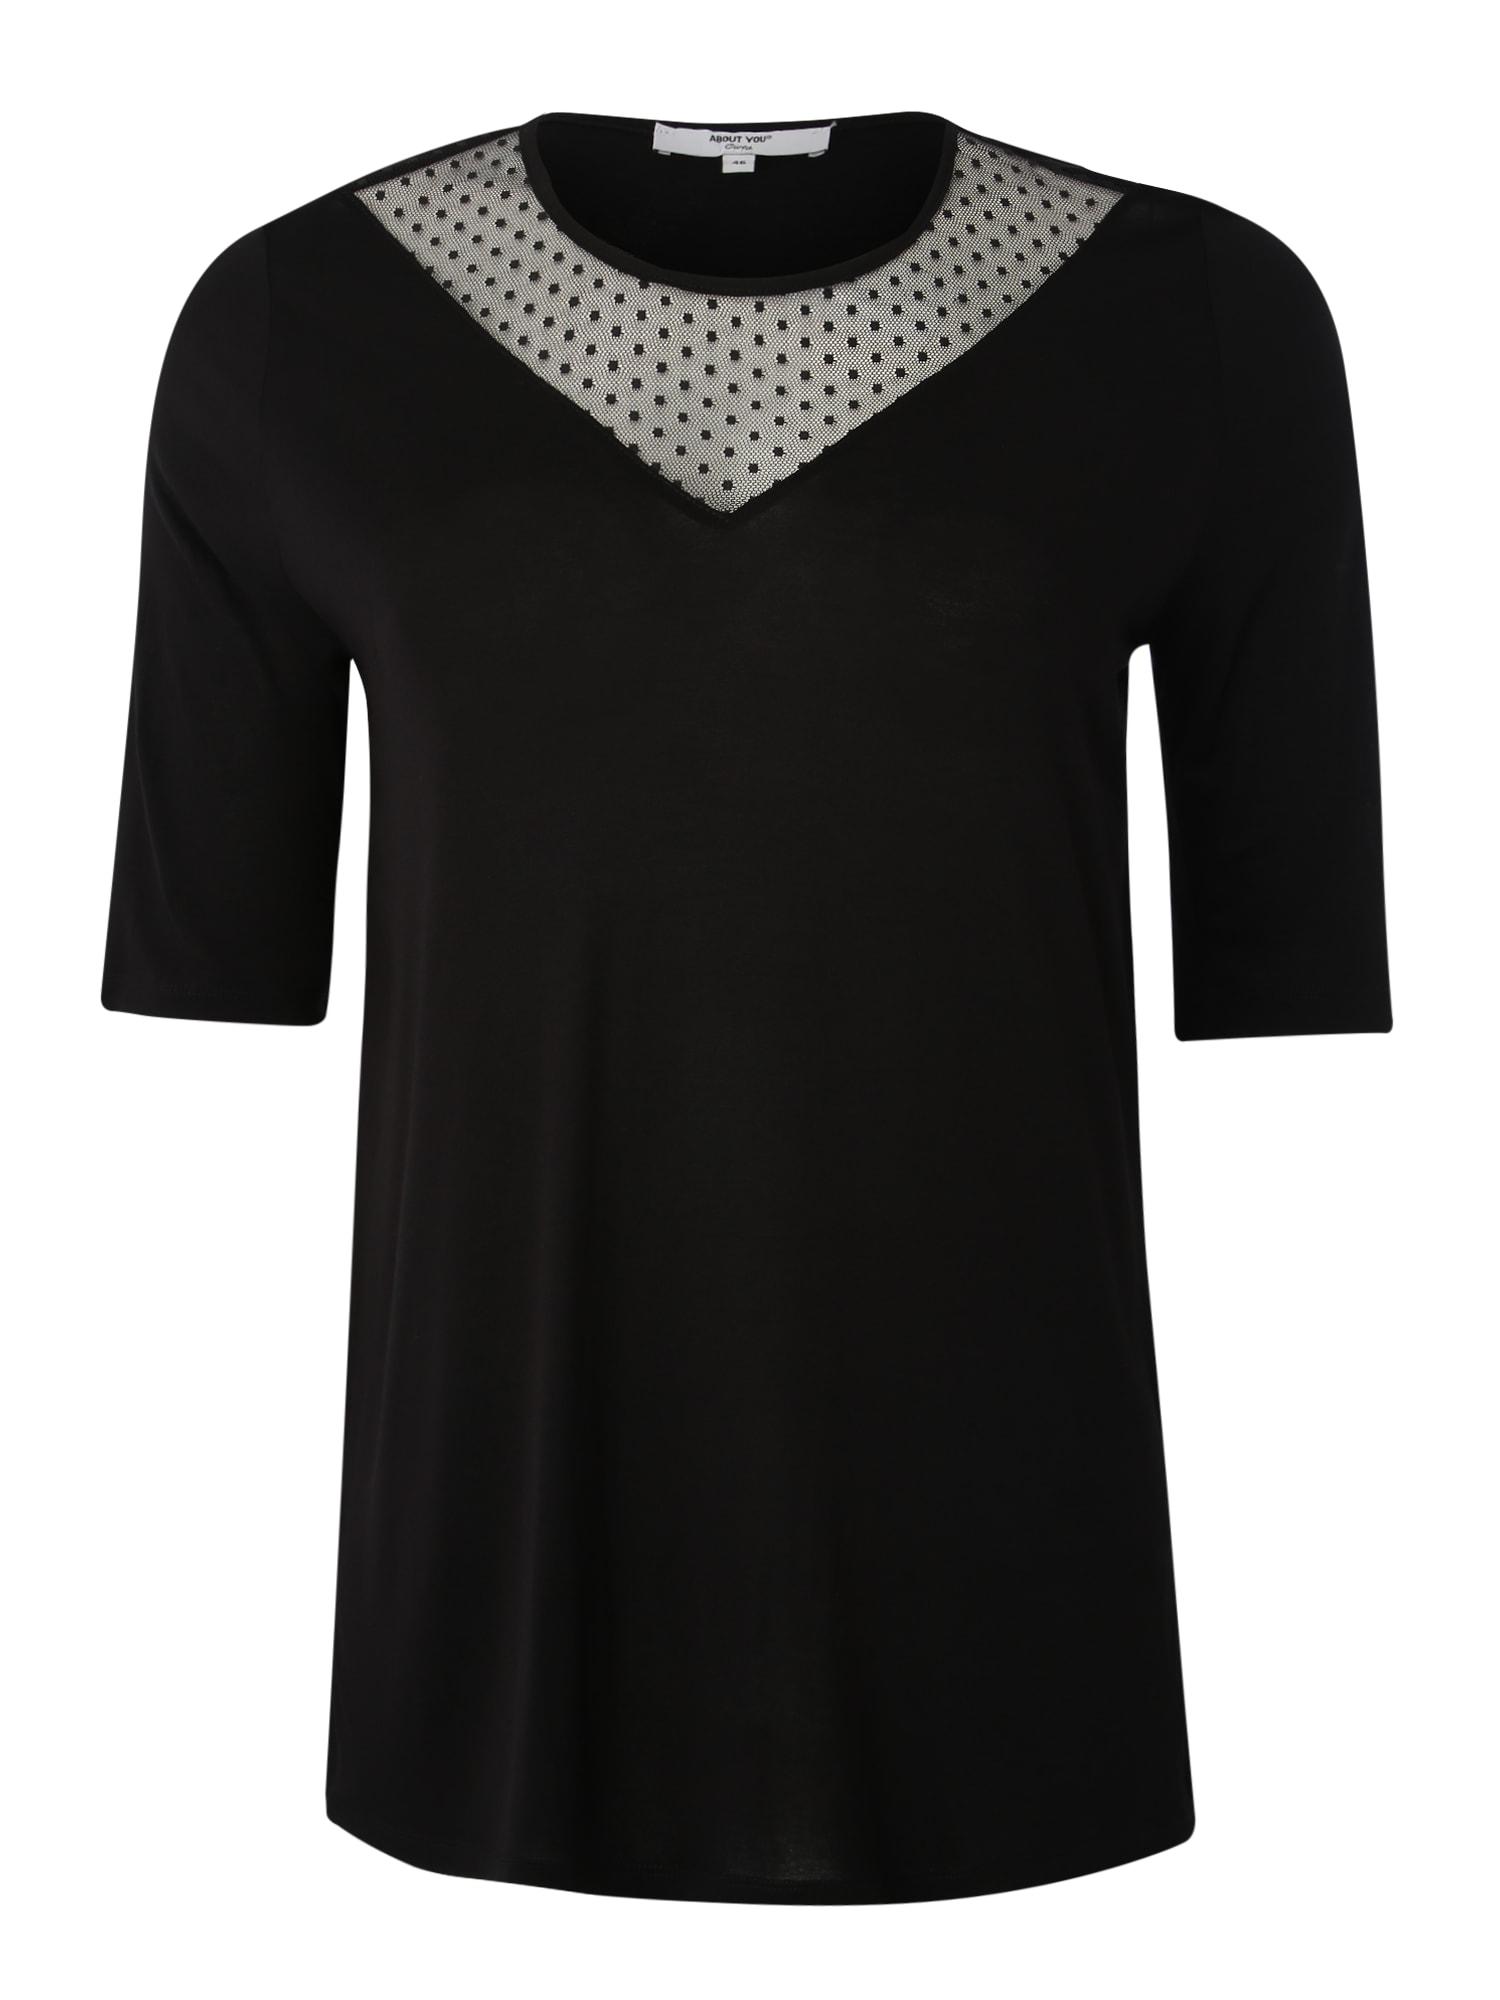 ABOUT YOU Curvy Marškinėliai 'Fatma' juoda